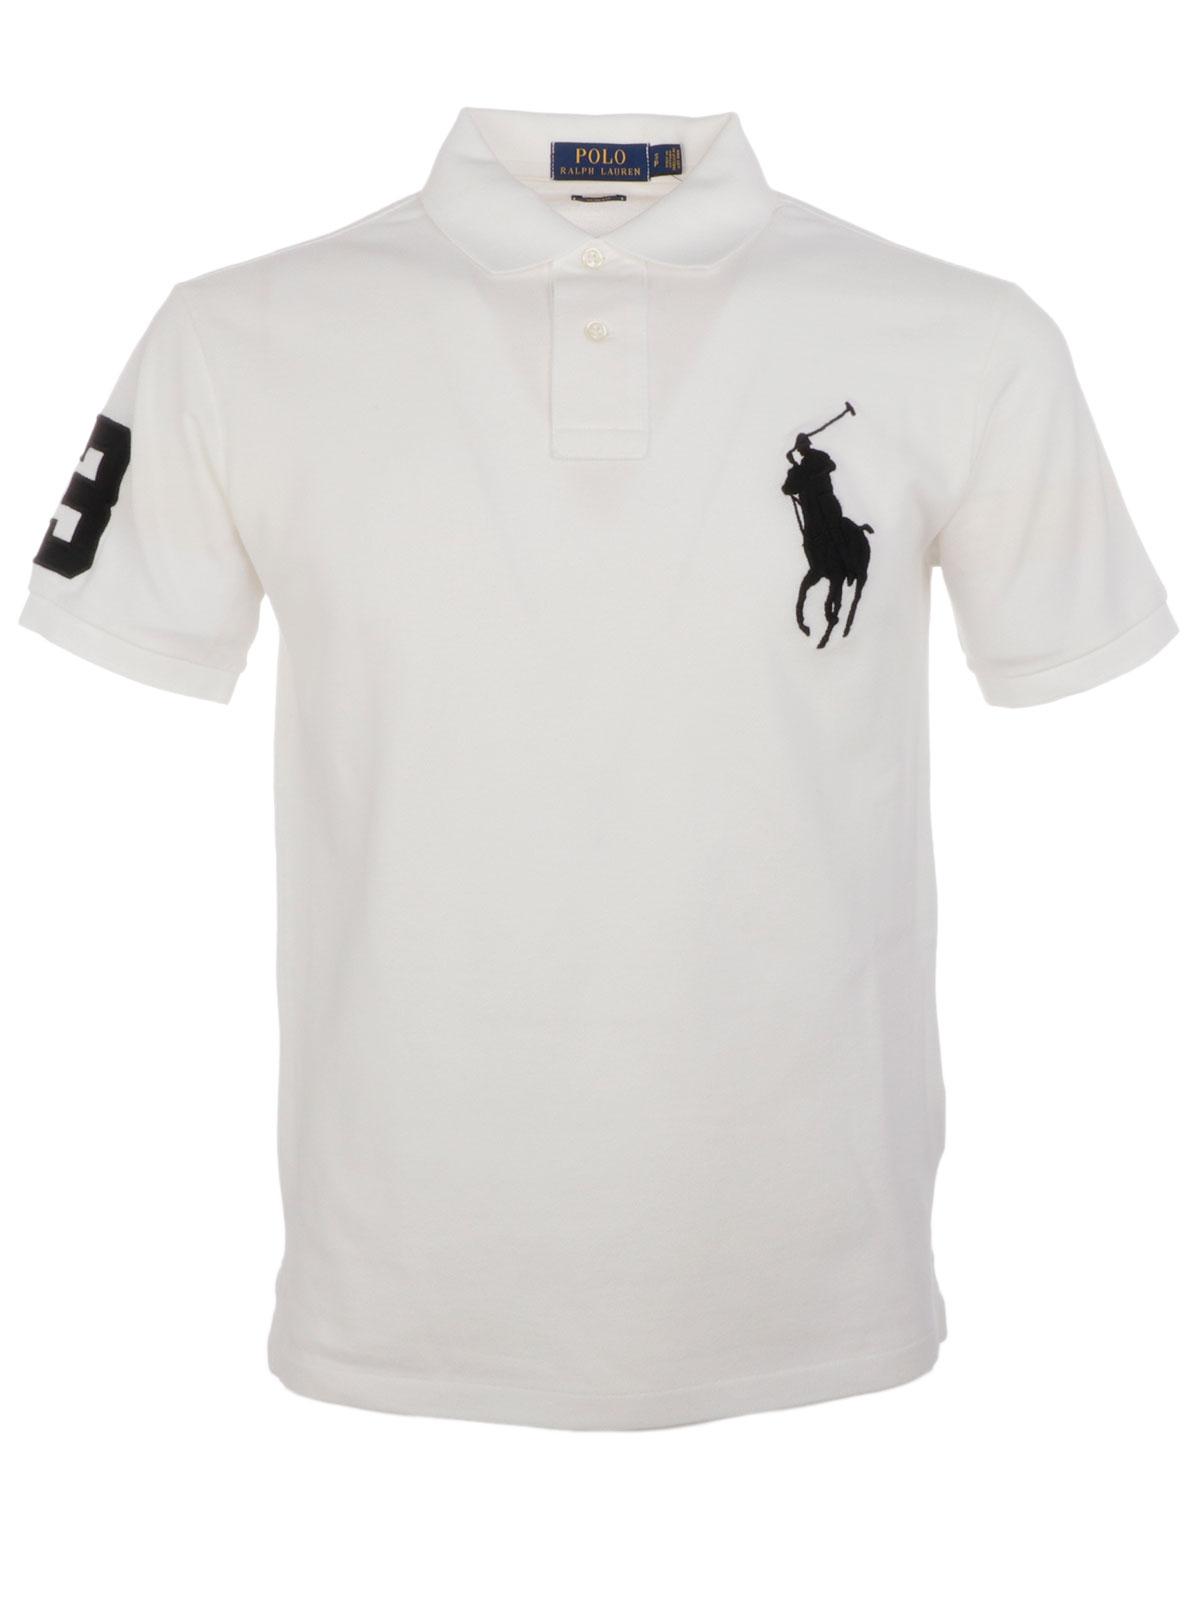 62b9b0afc POLO RALPH LAUREN Men s Maxi Logo Polo Shirt White